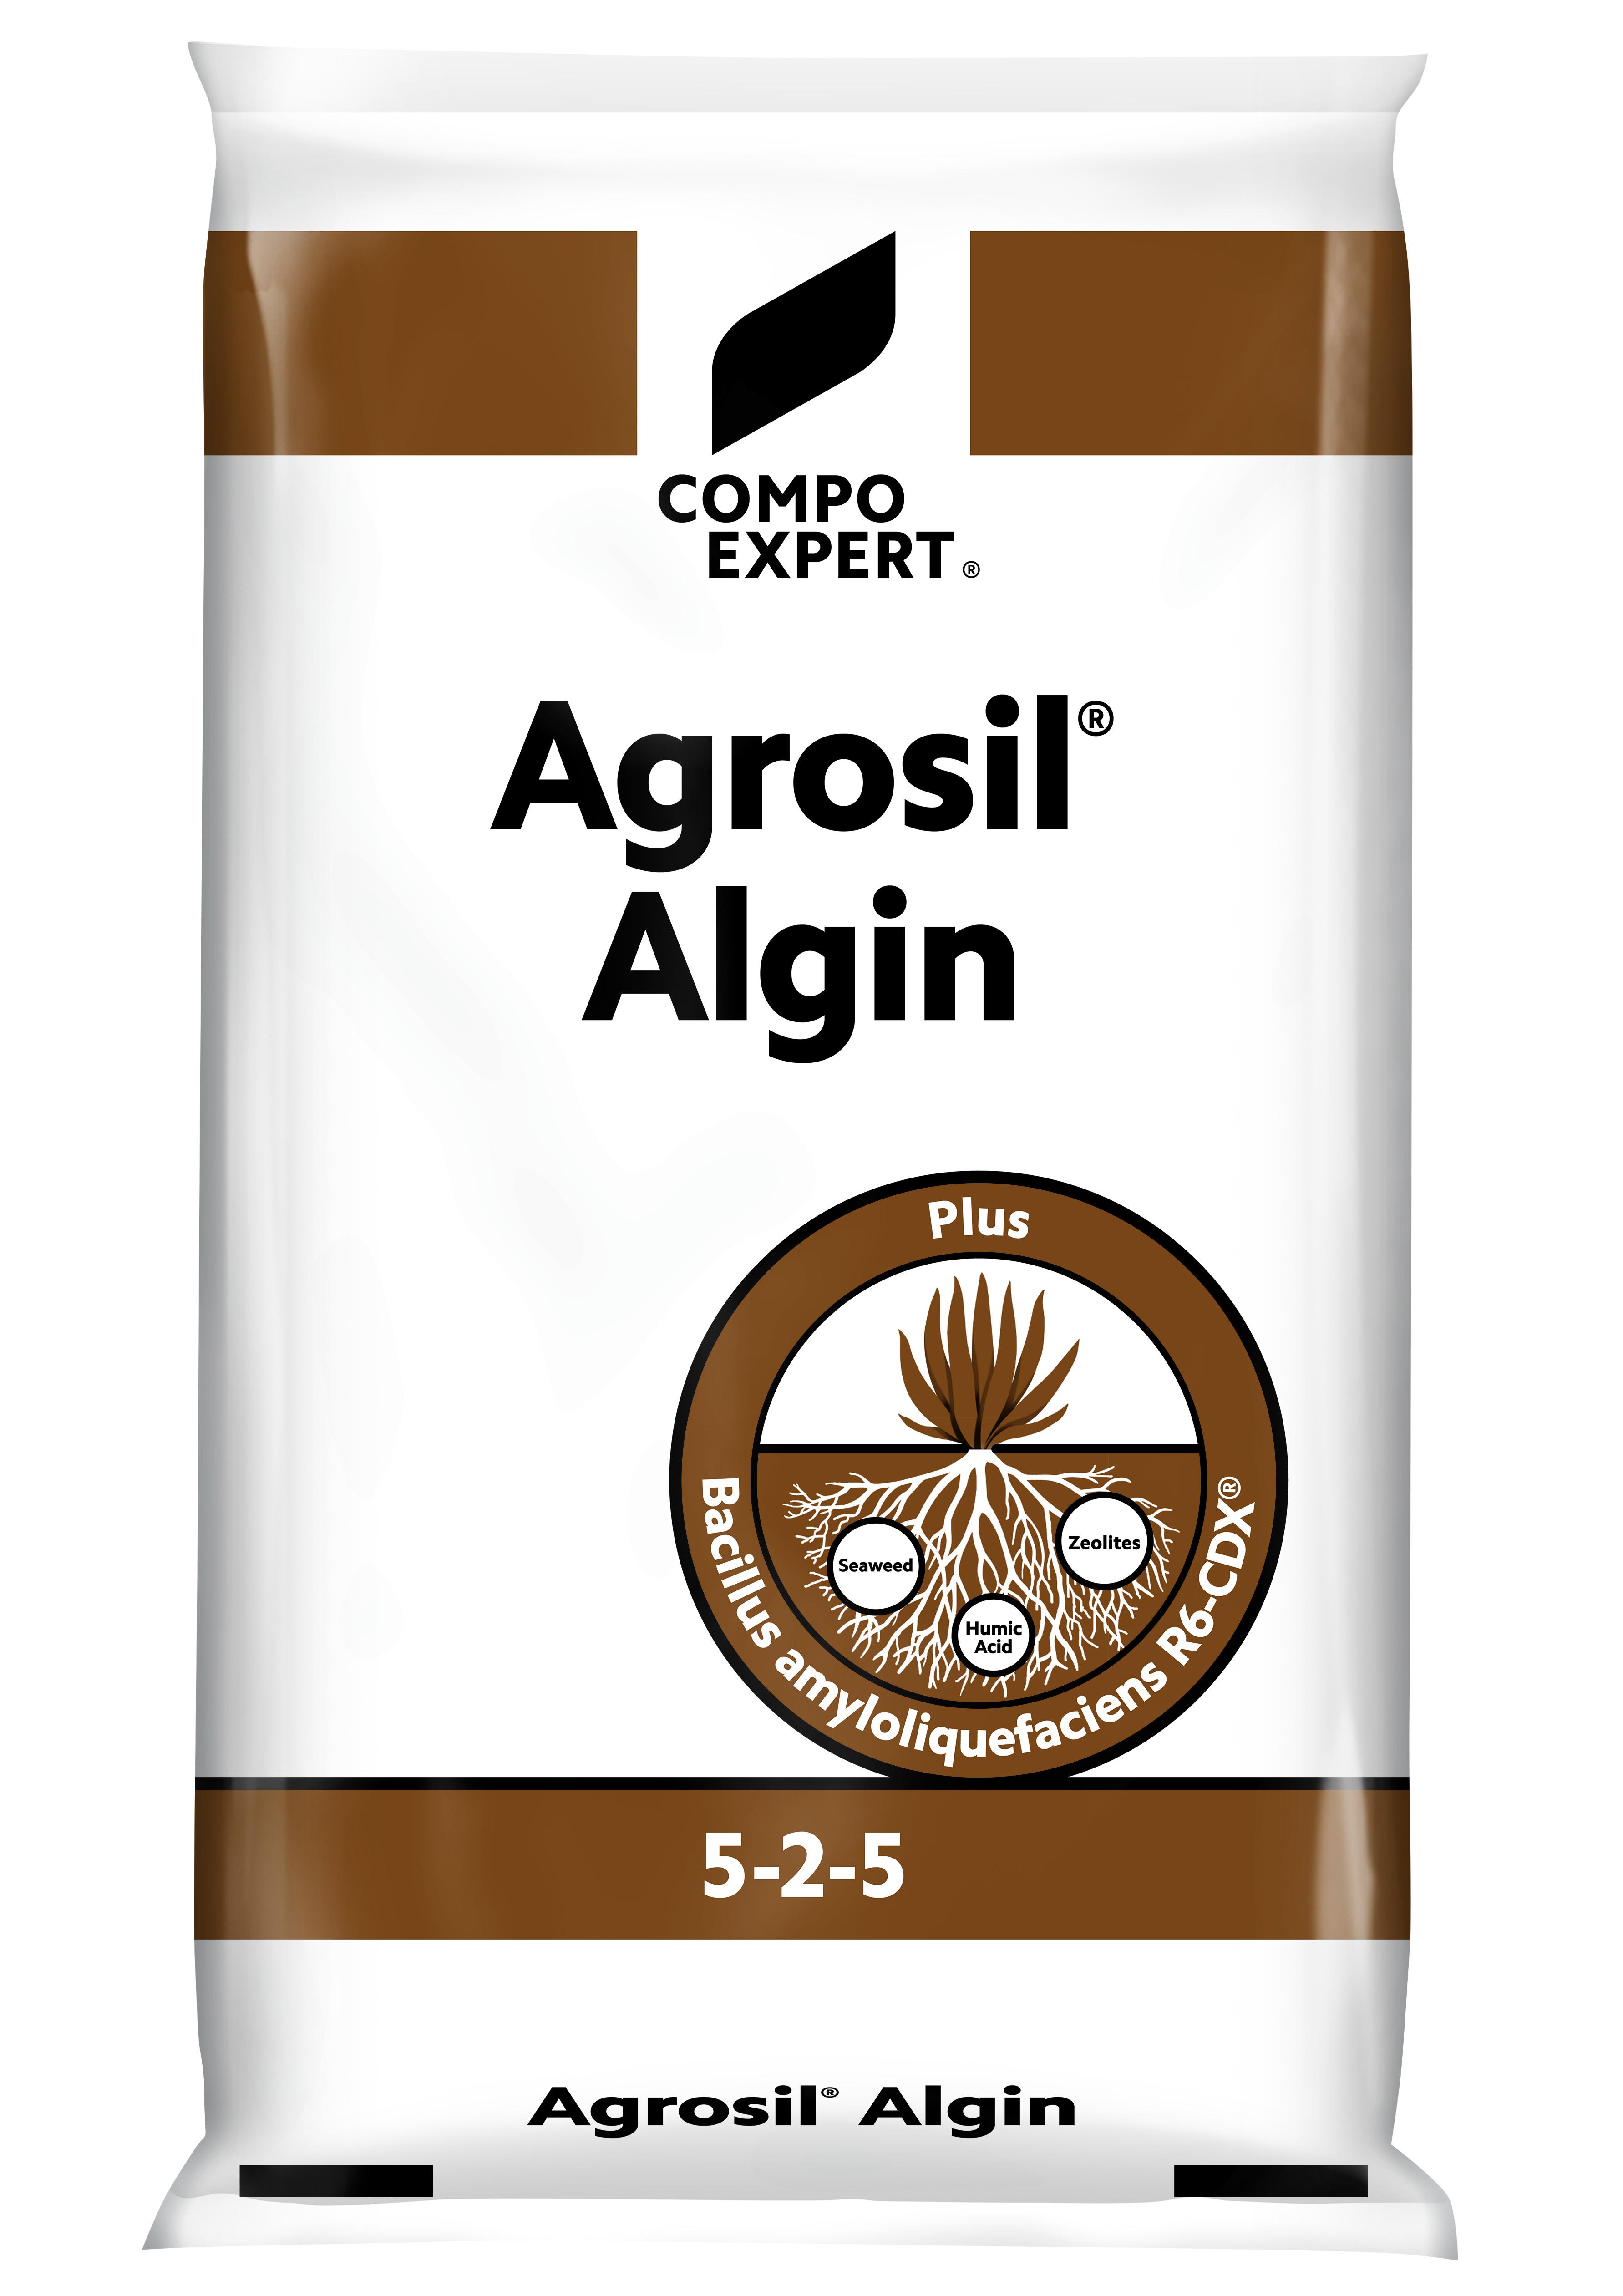 Agrosil Algin